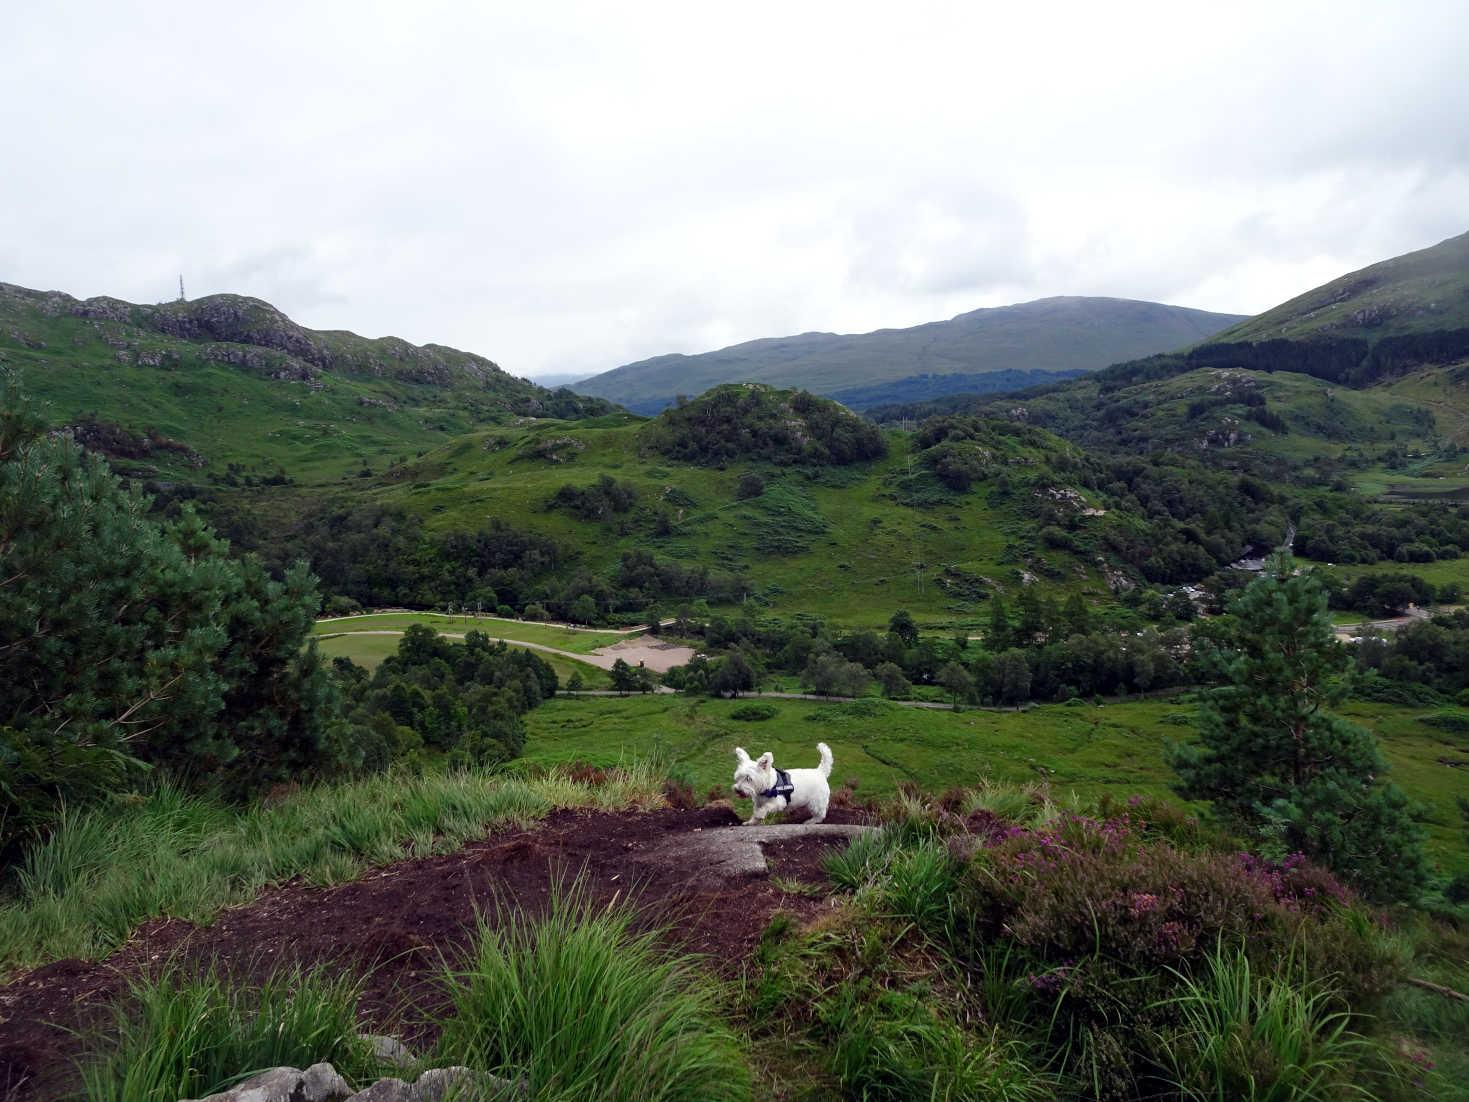 poppy the westie on the hills in glenfinnan